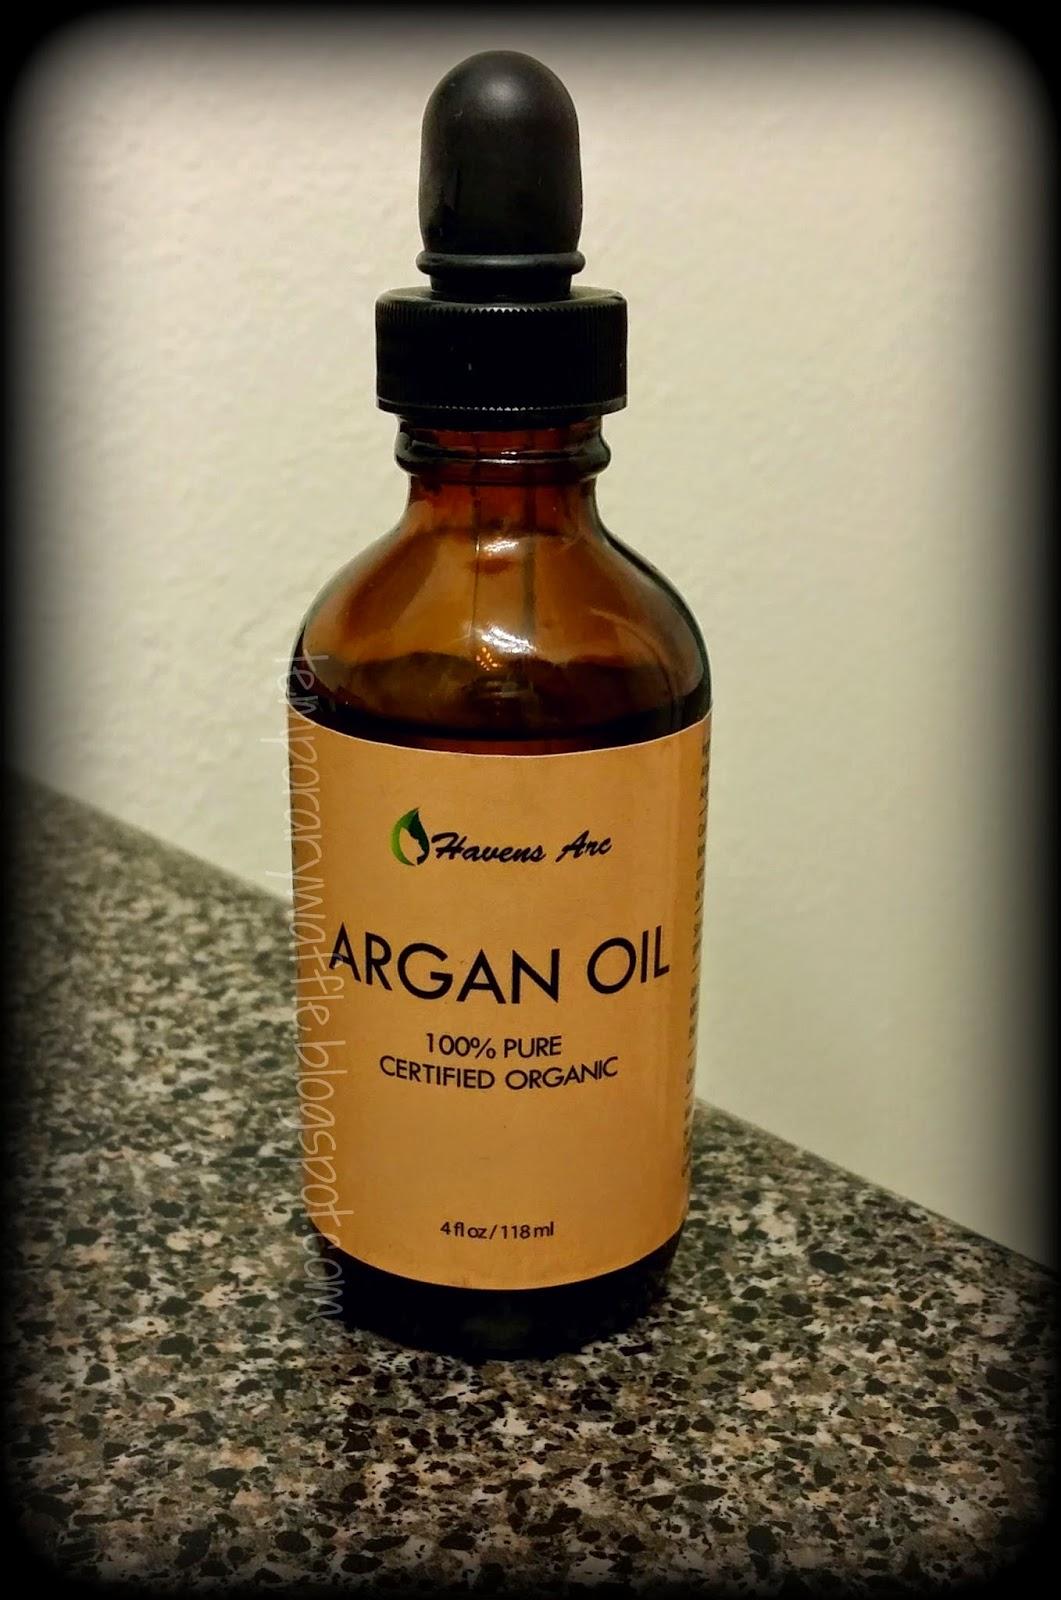 All Natural Argan Oil For Hair